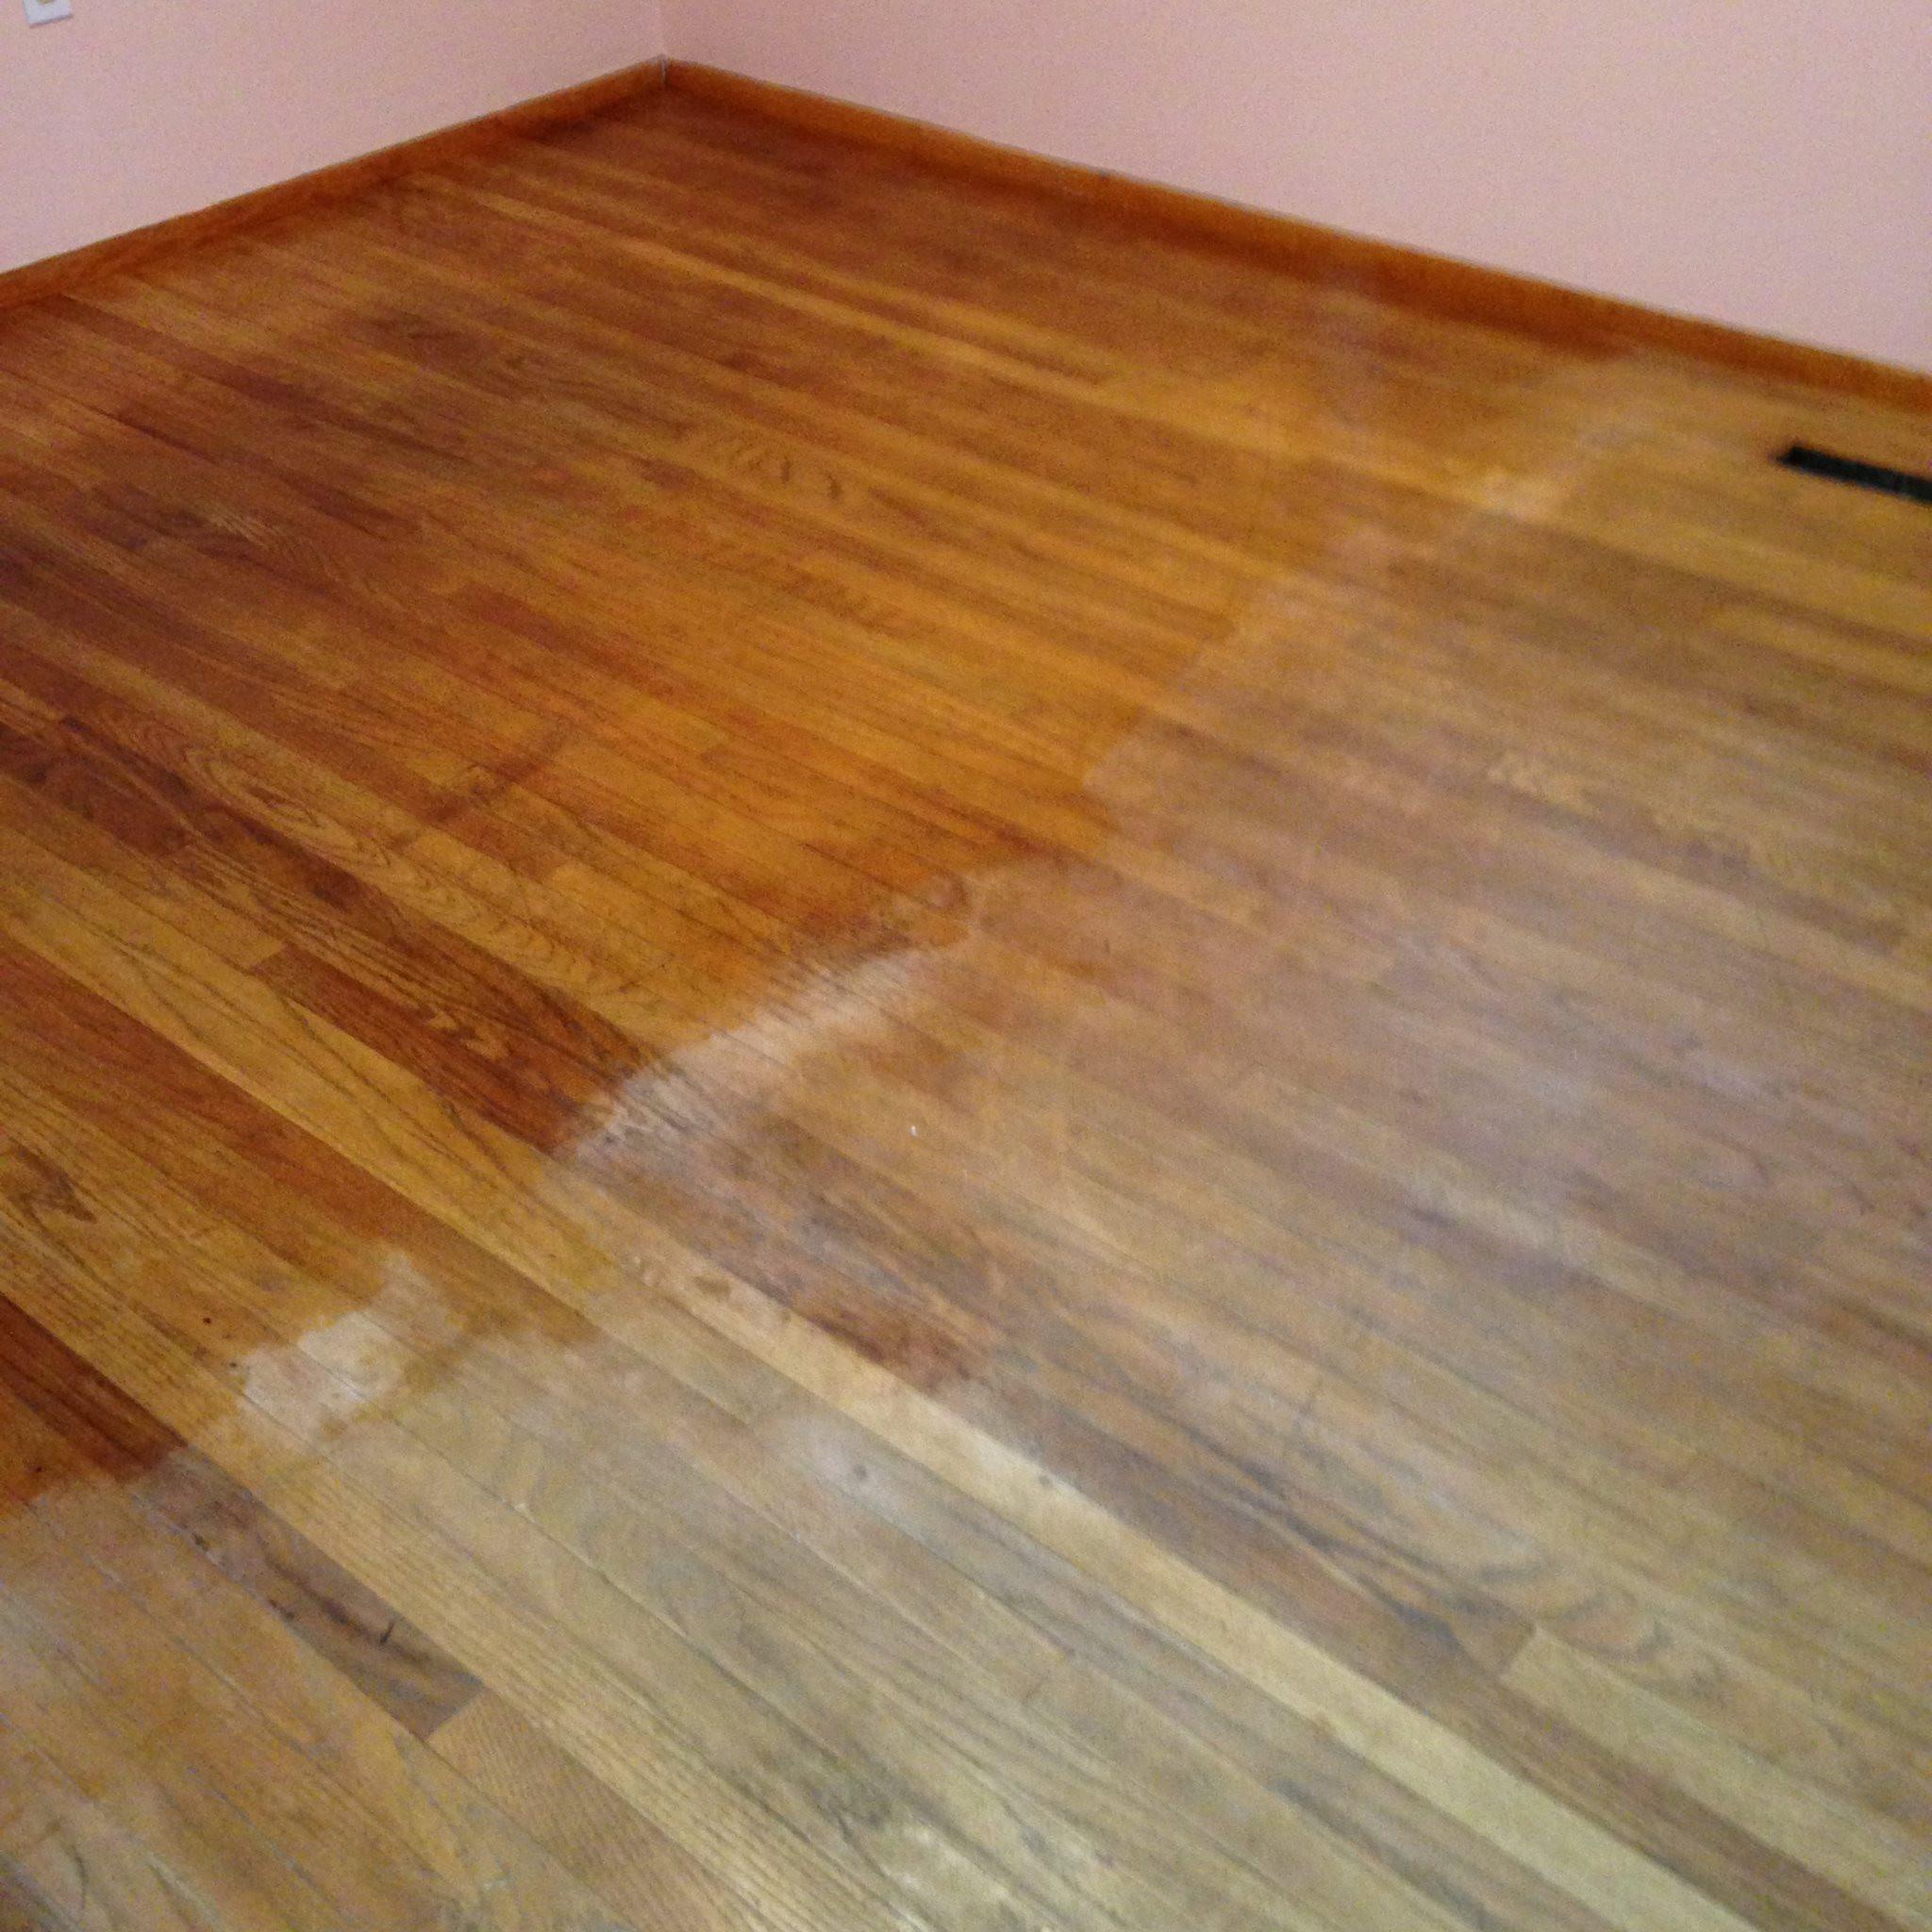 bona hardwood floor cleaning pads of 15 wood floor hacks every homeowner needs to know for wood floor hacks 15